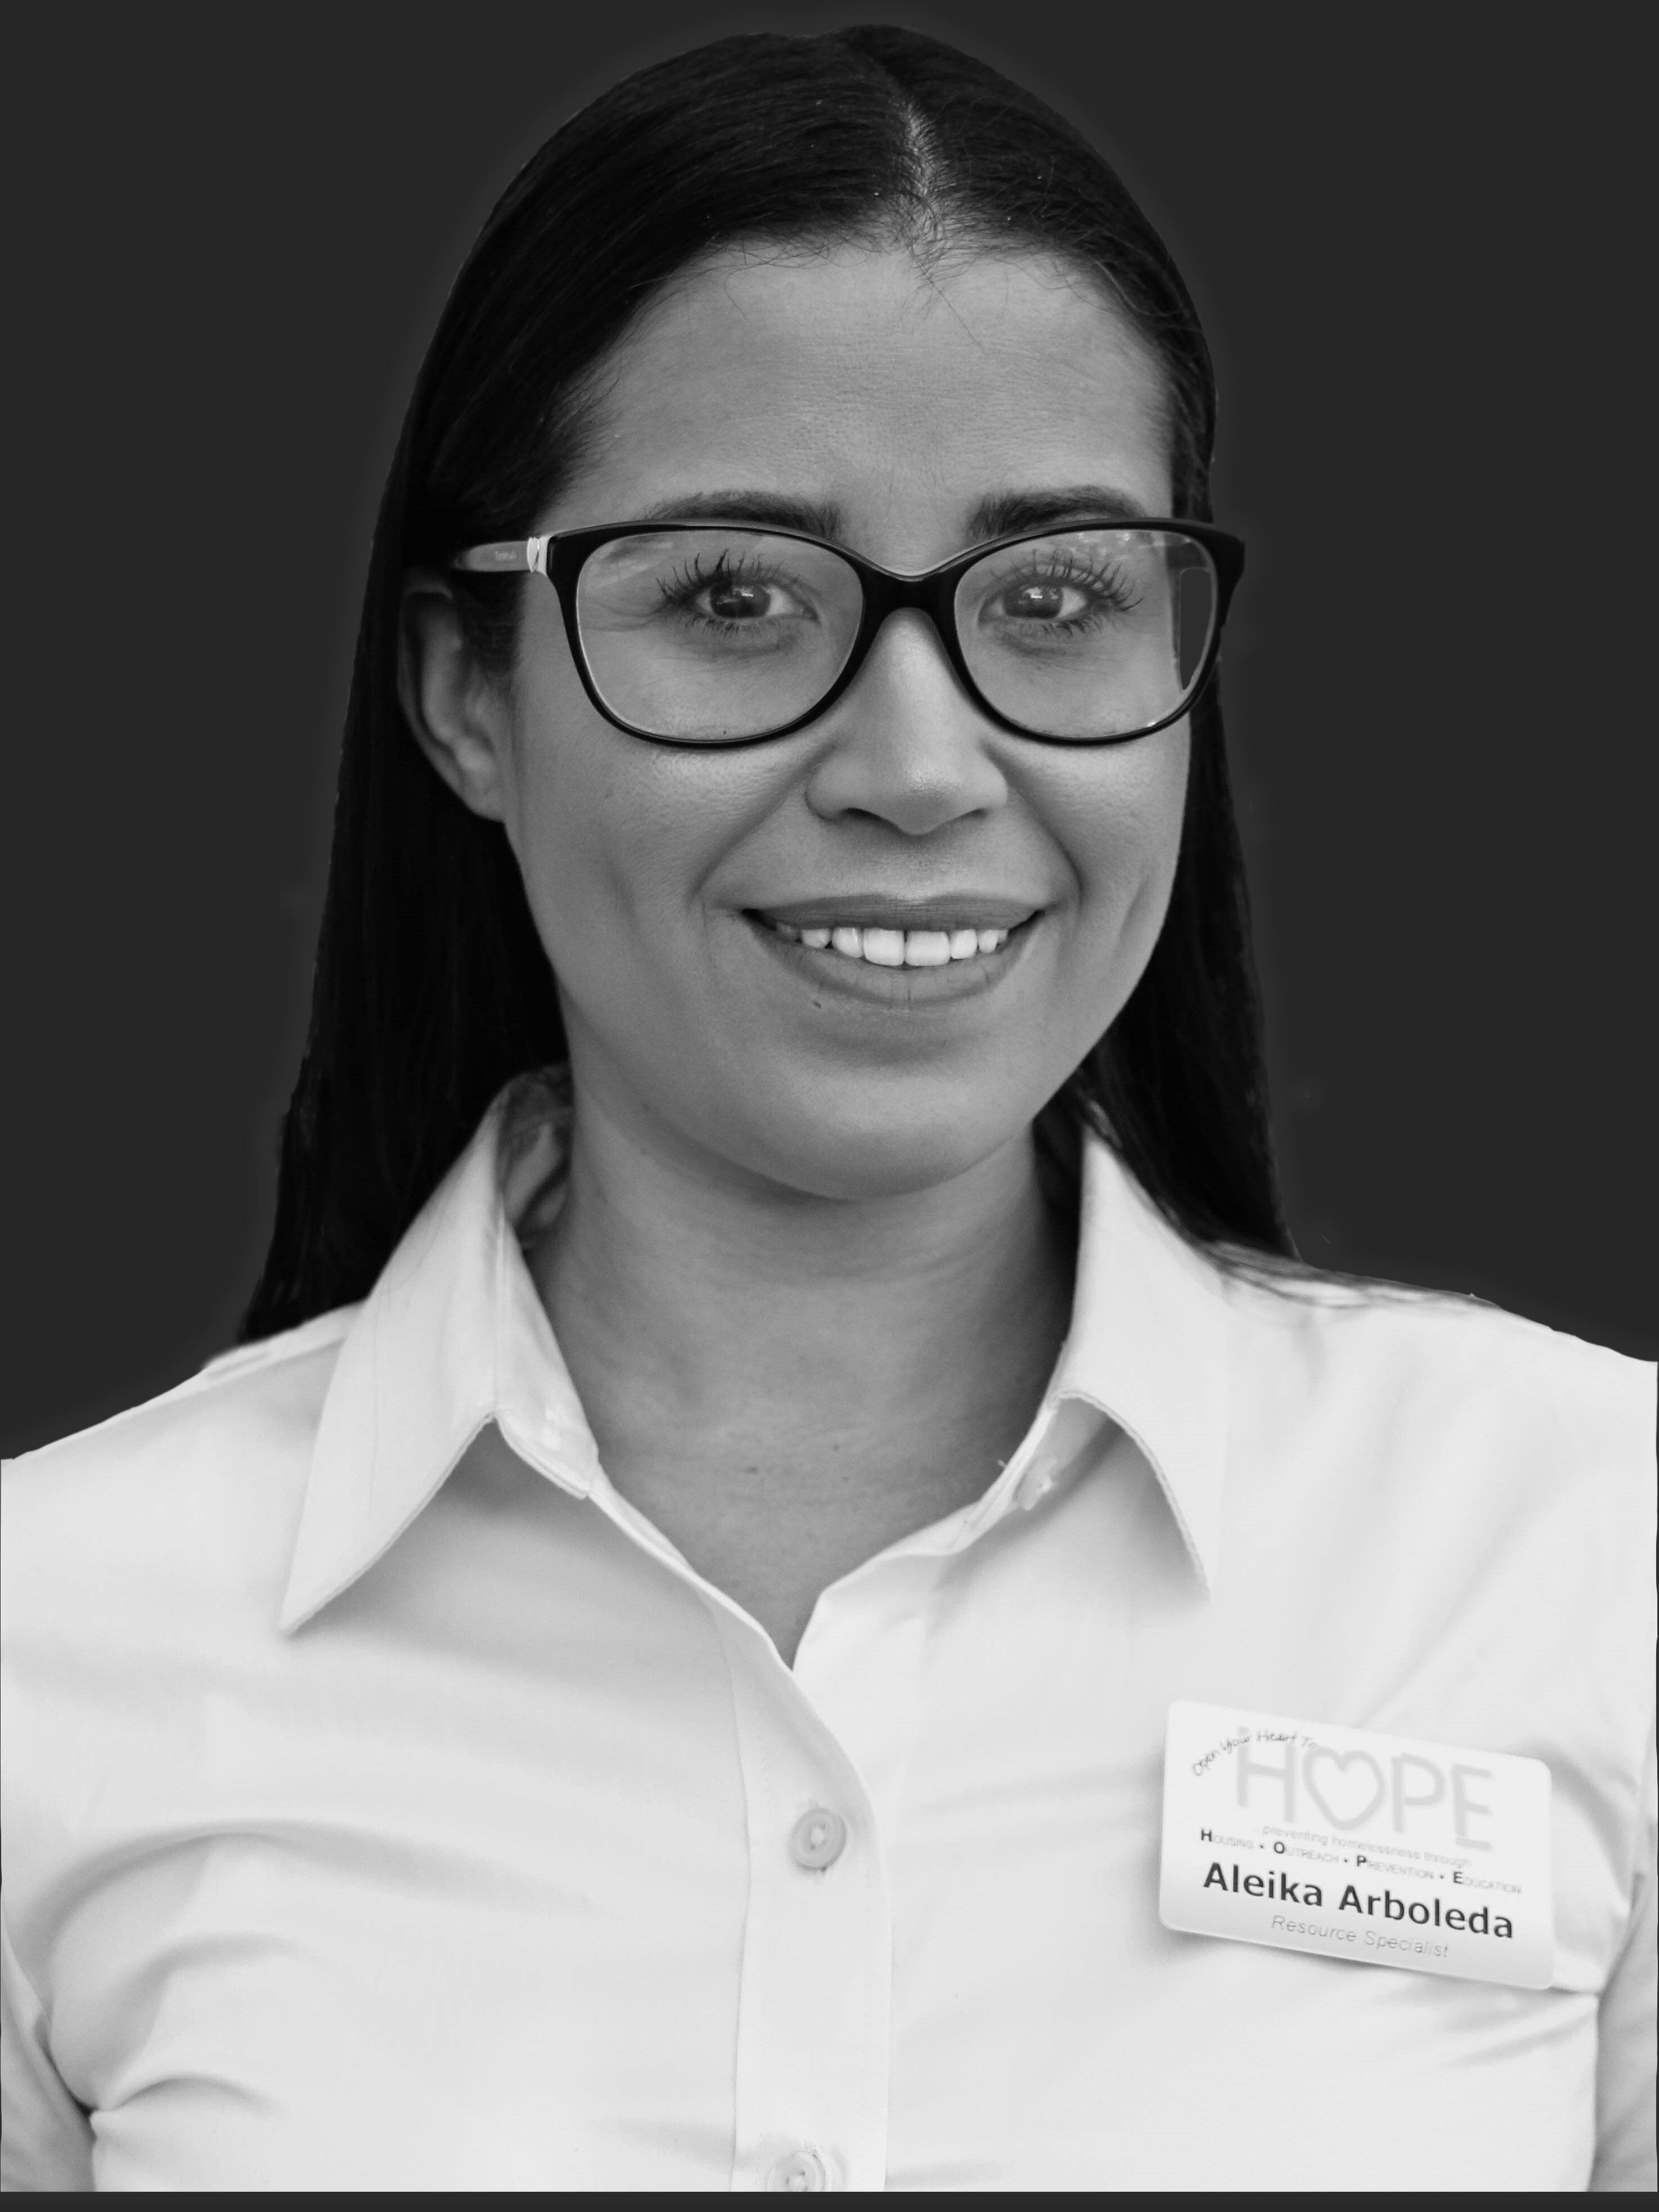 Aleika Arboleda, Case Manager